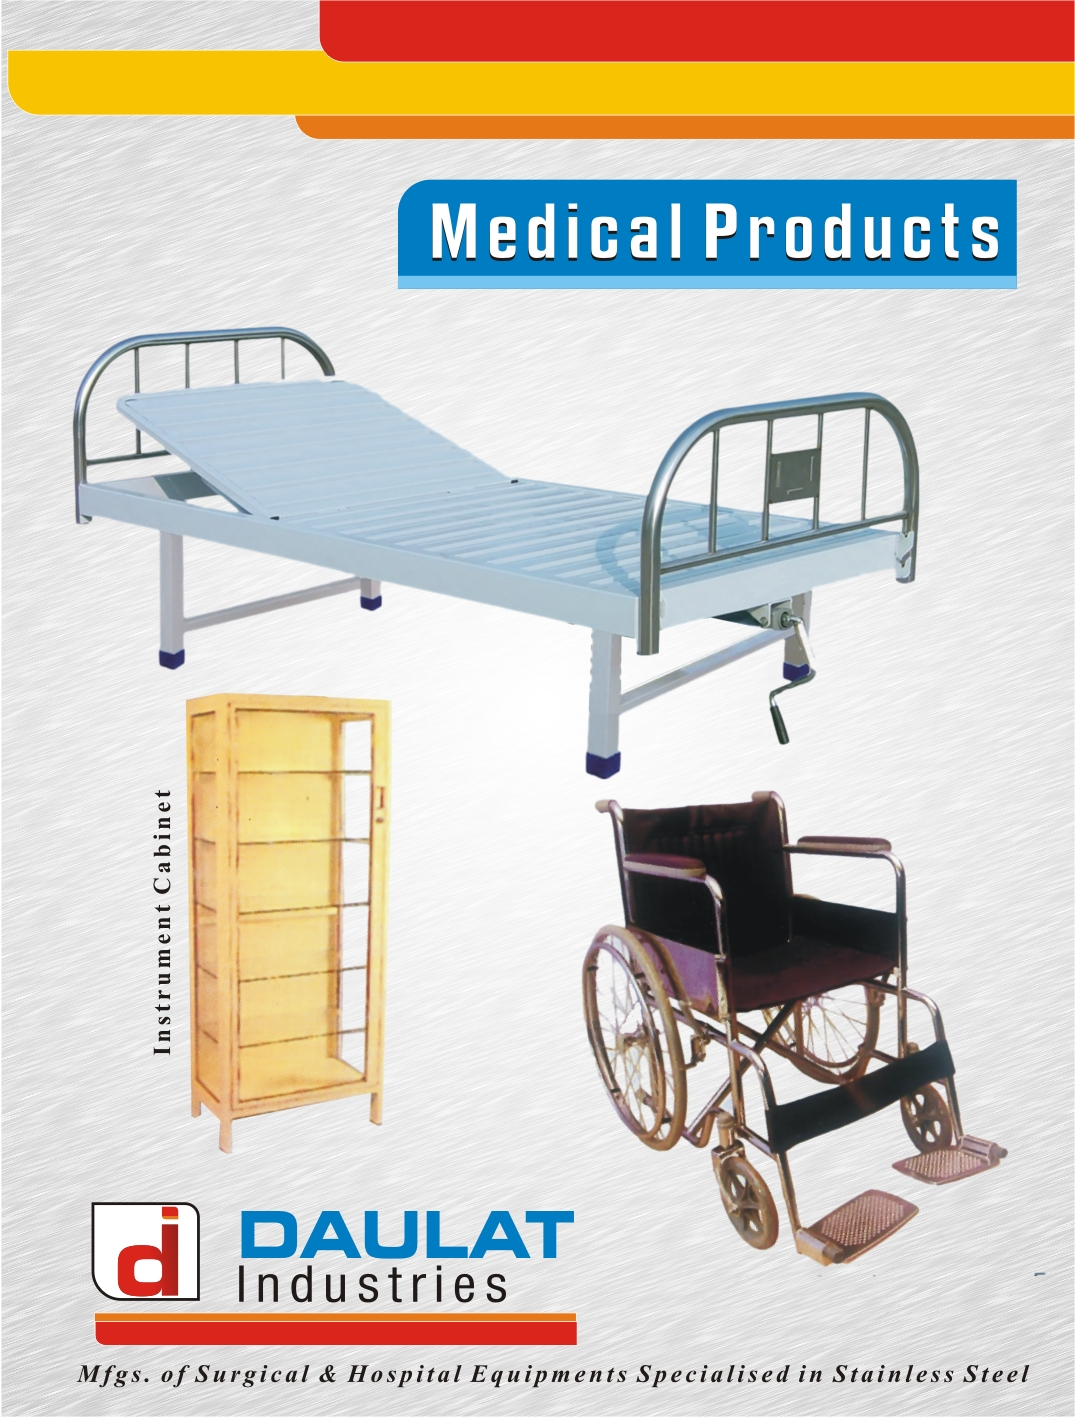 Daulat Industries